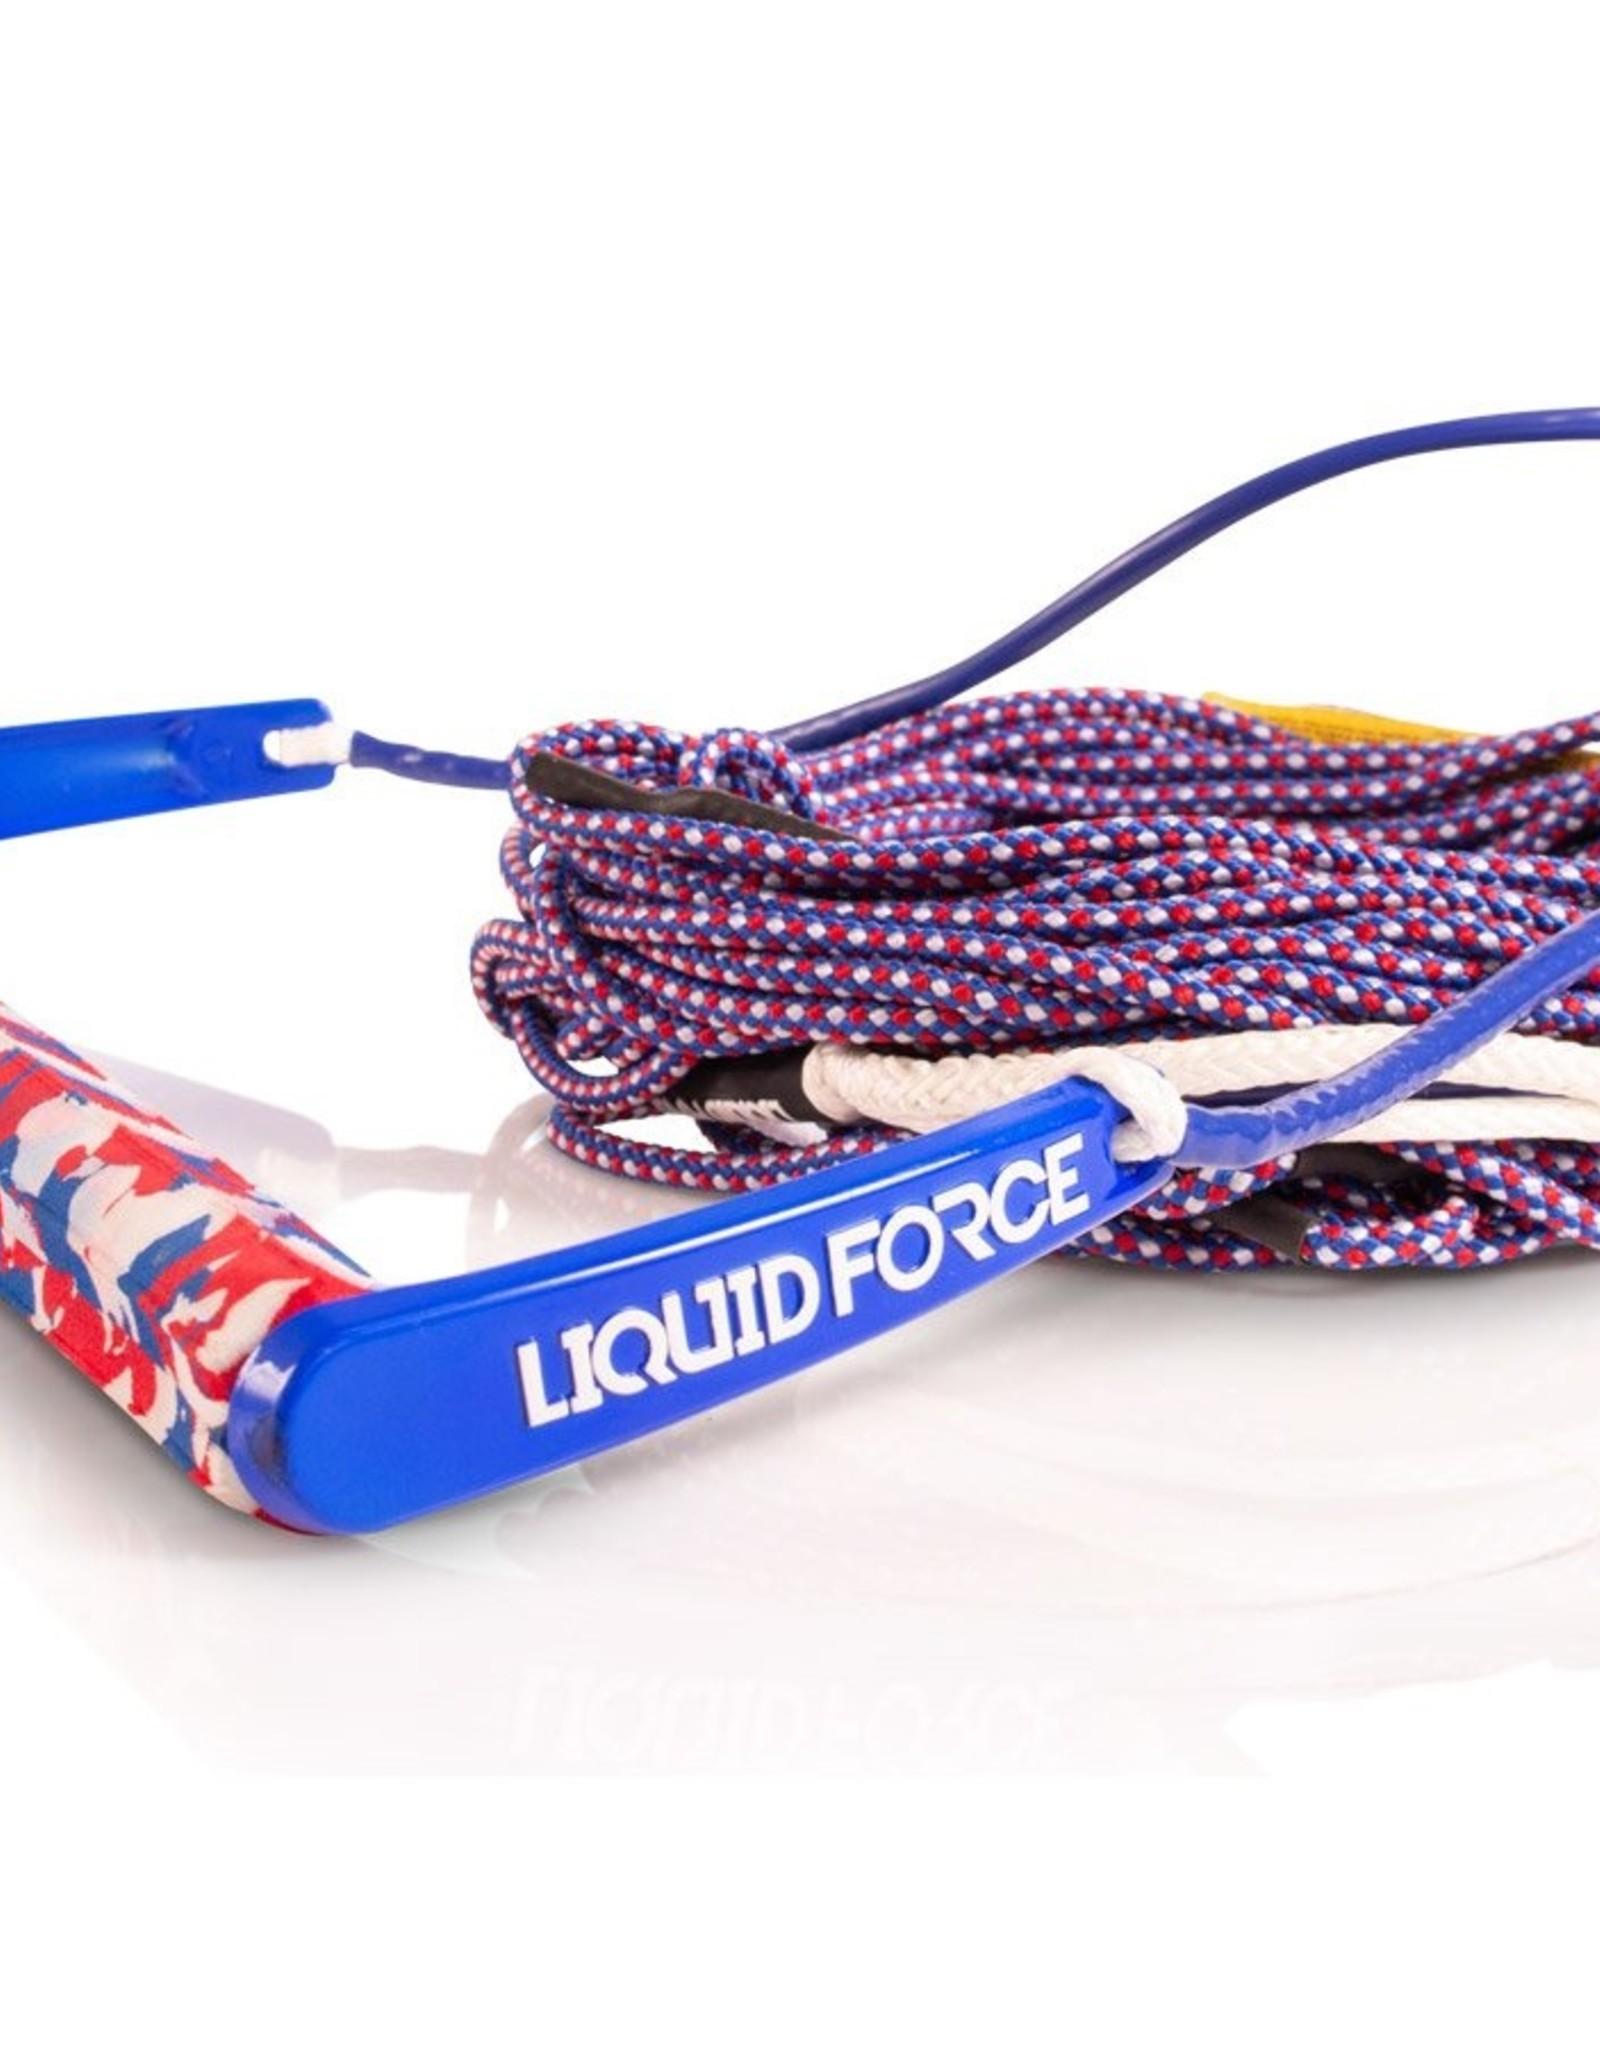 Liquid Force TEAM/ H-BRAID AMERICA 70'  ROPE COMBO